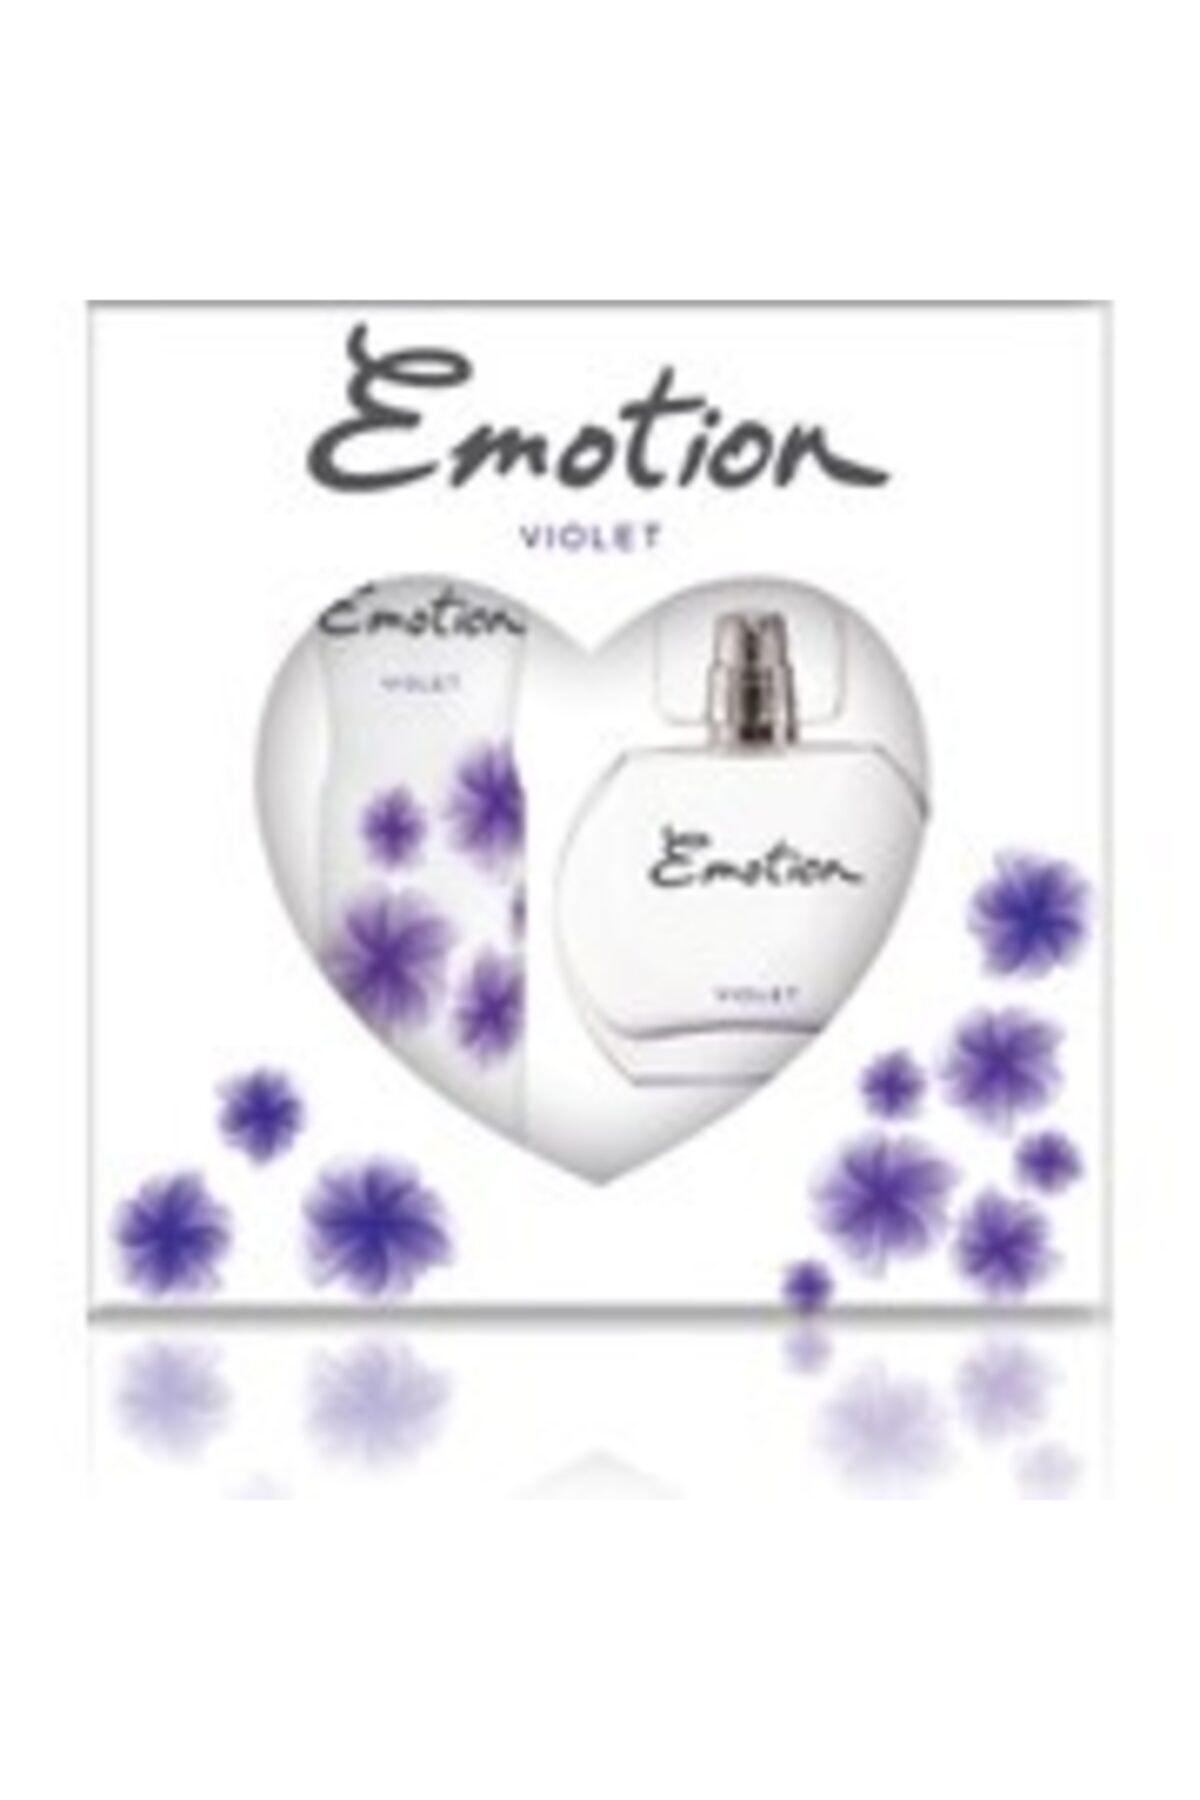 Emotion Vıolet Bayan Edt 50 Ml + 150 Ml Deodorant Parfüm Seti 2